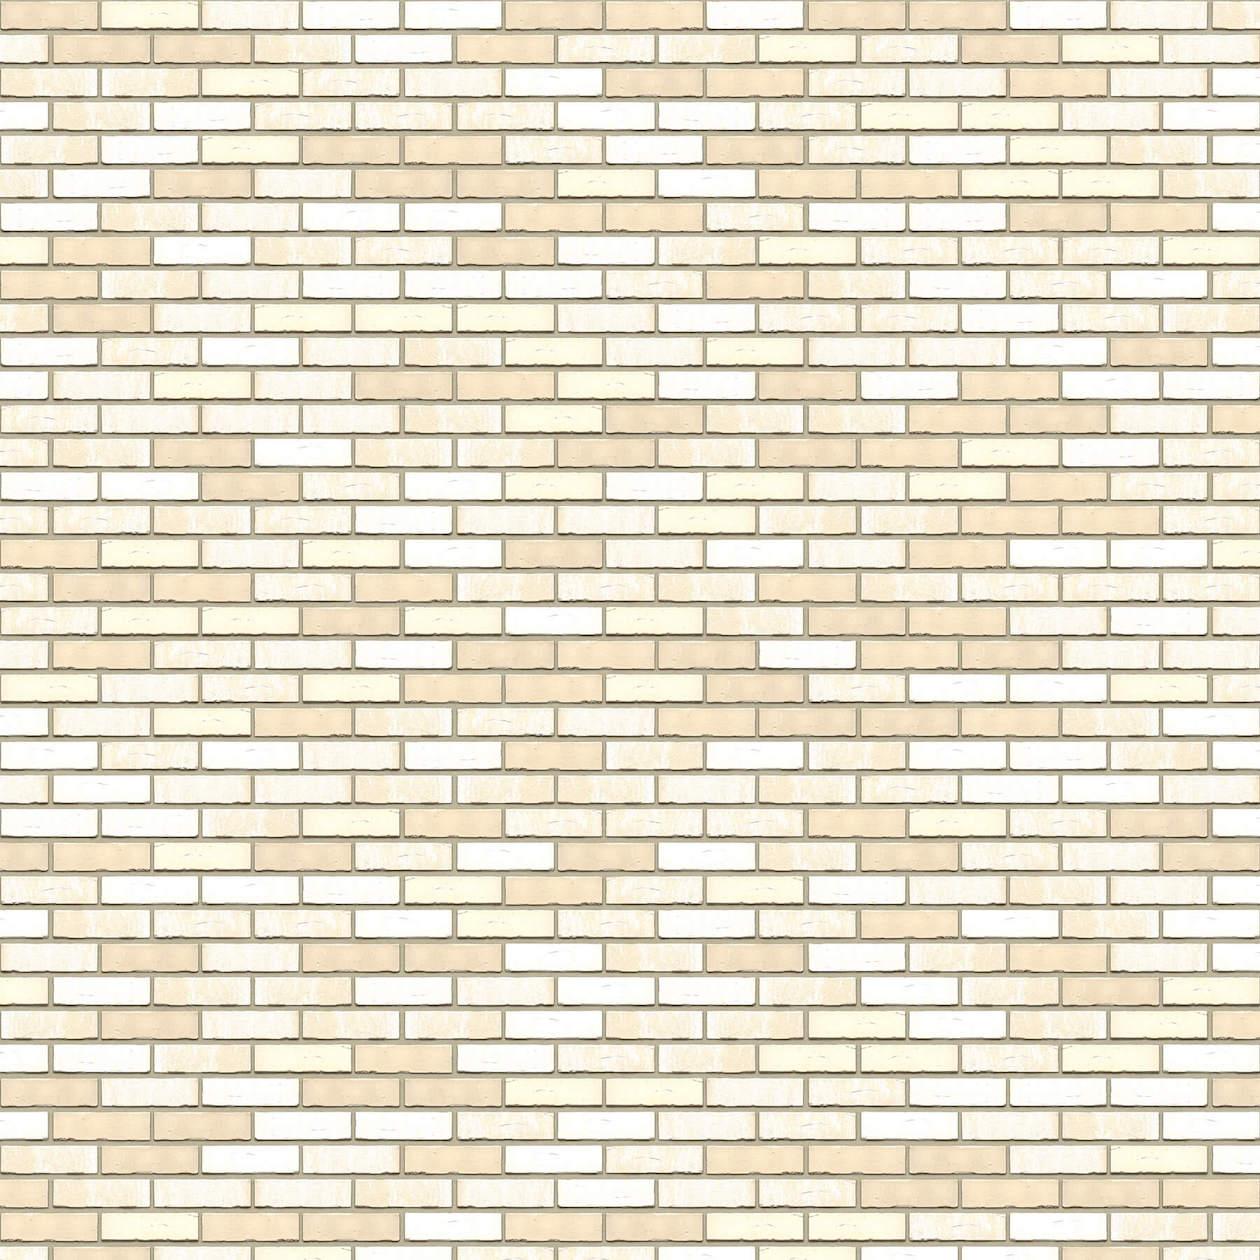 Puna-cigla-FeldHaus-Klinker-brick-house-nf-k-733-Bez Fuga